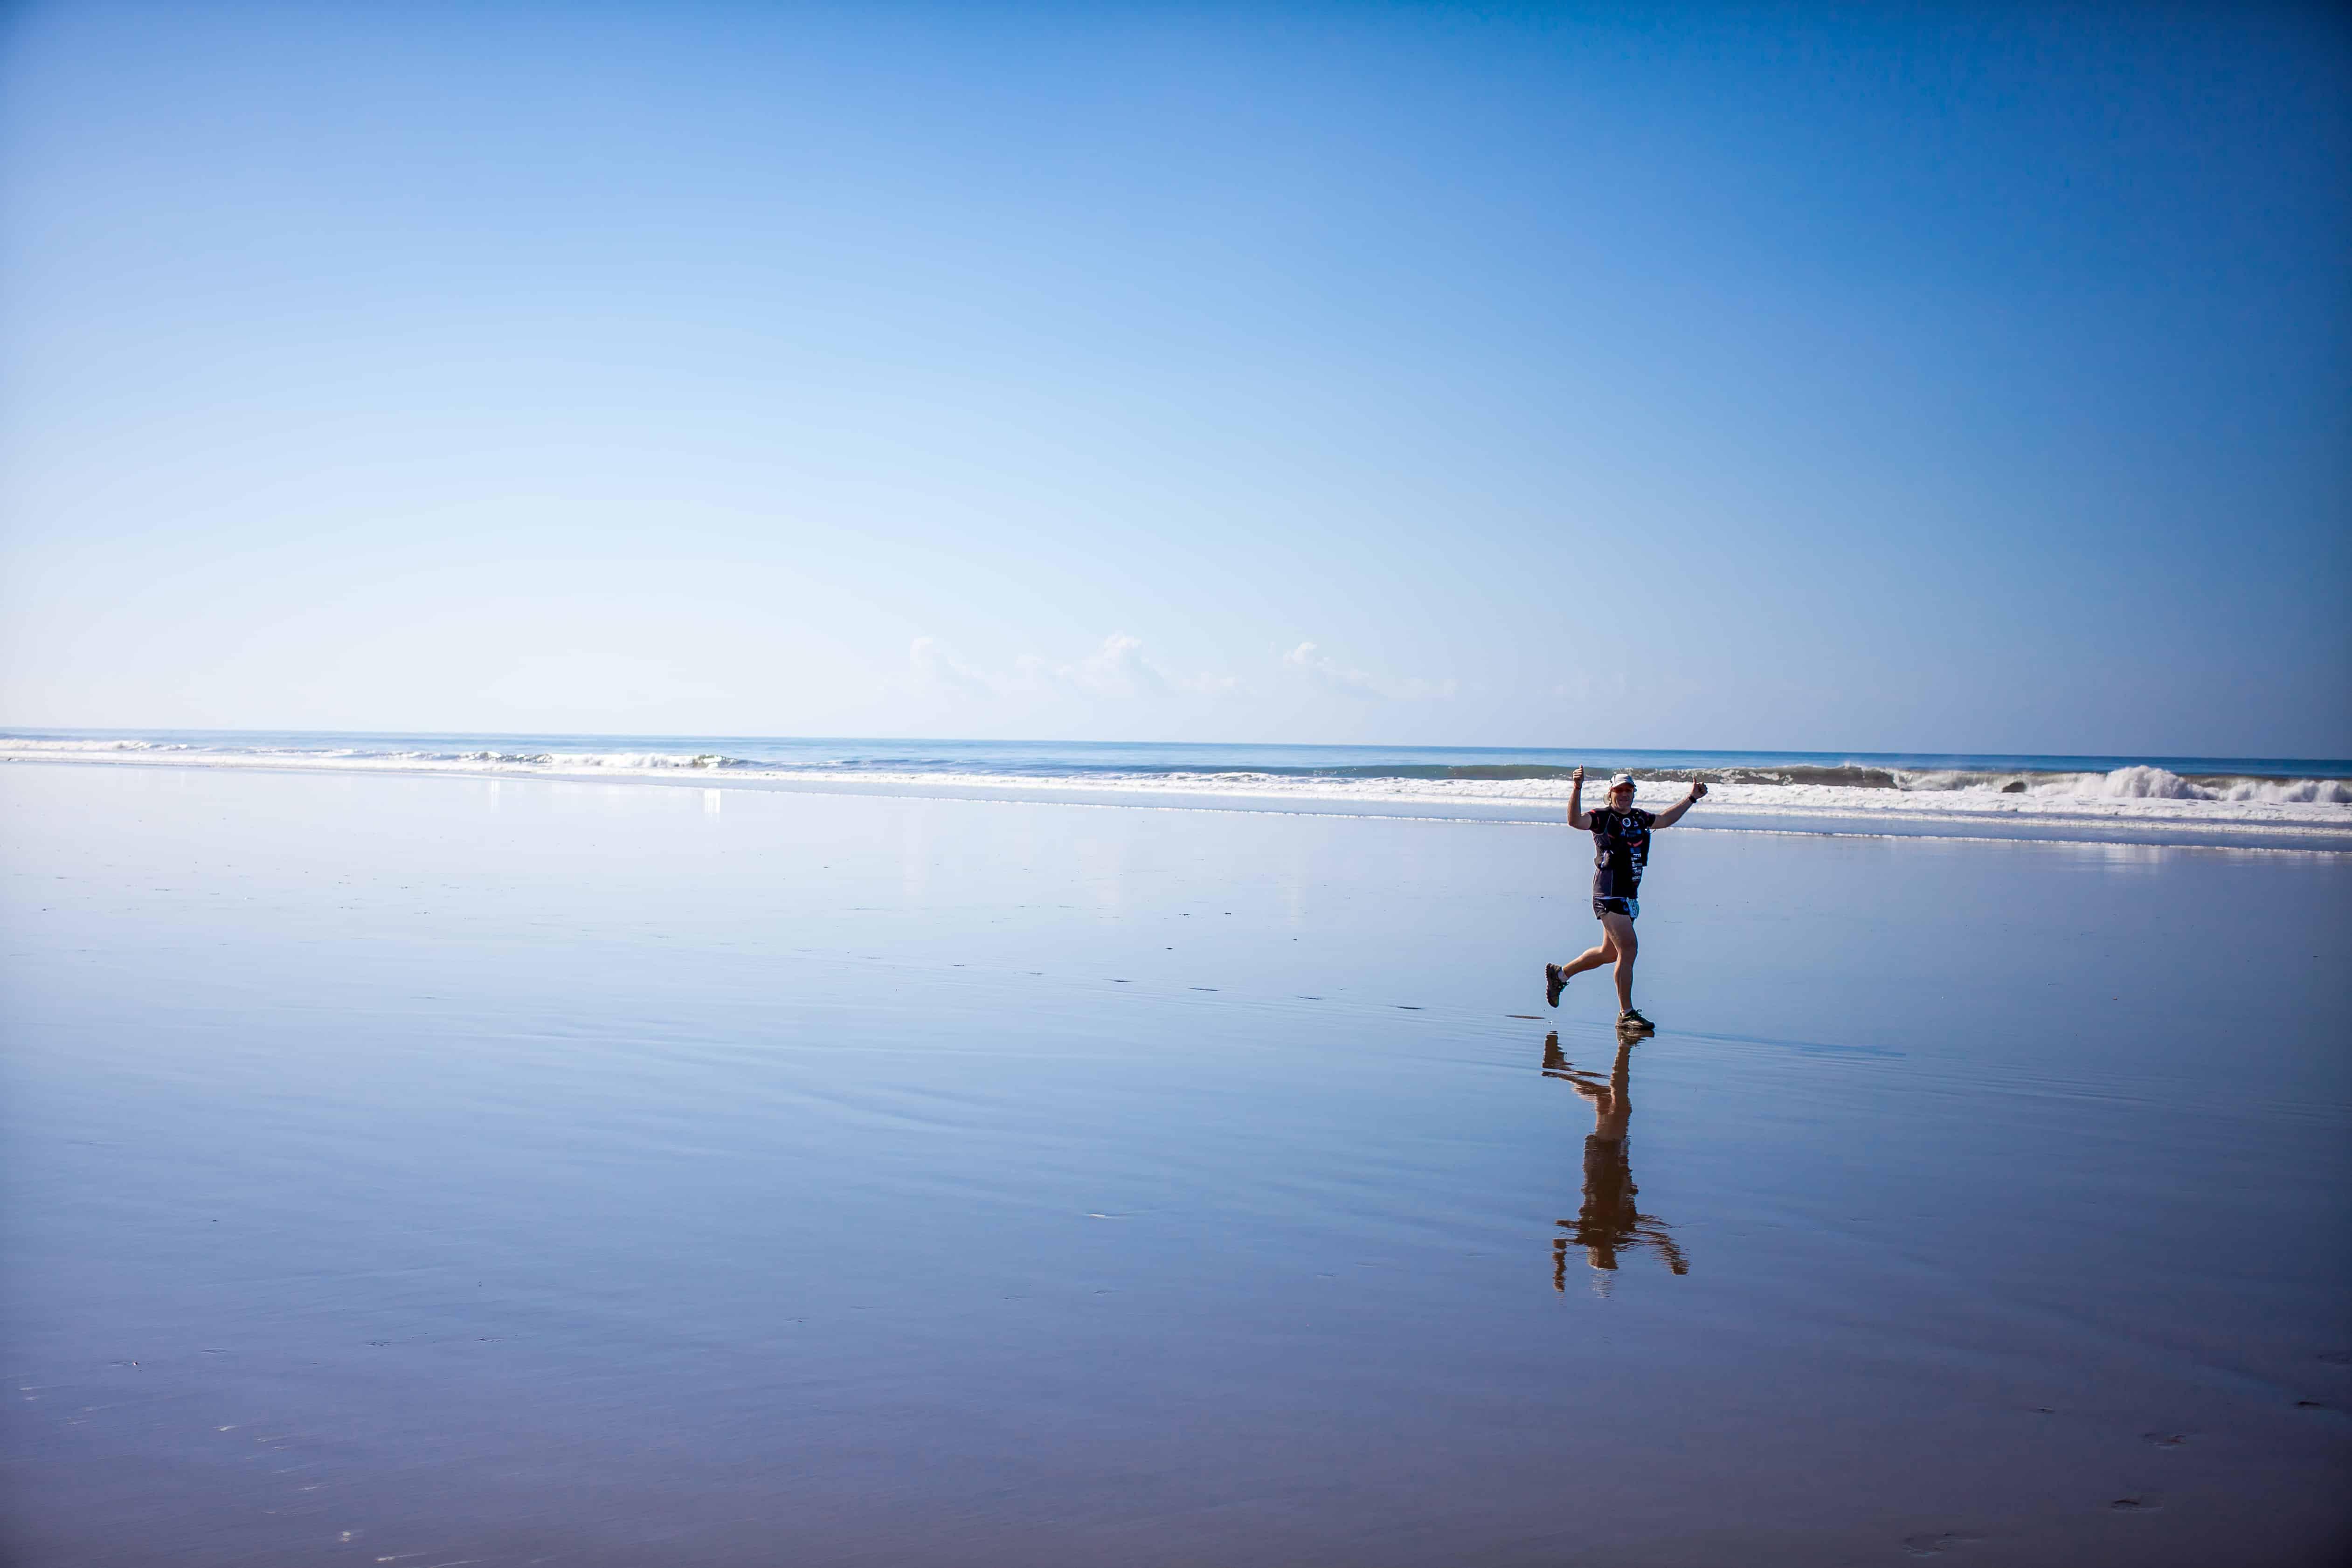 The Coastal Challenge in Costa Rica